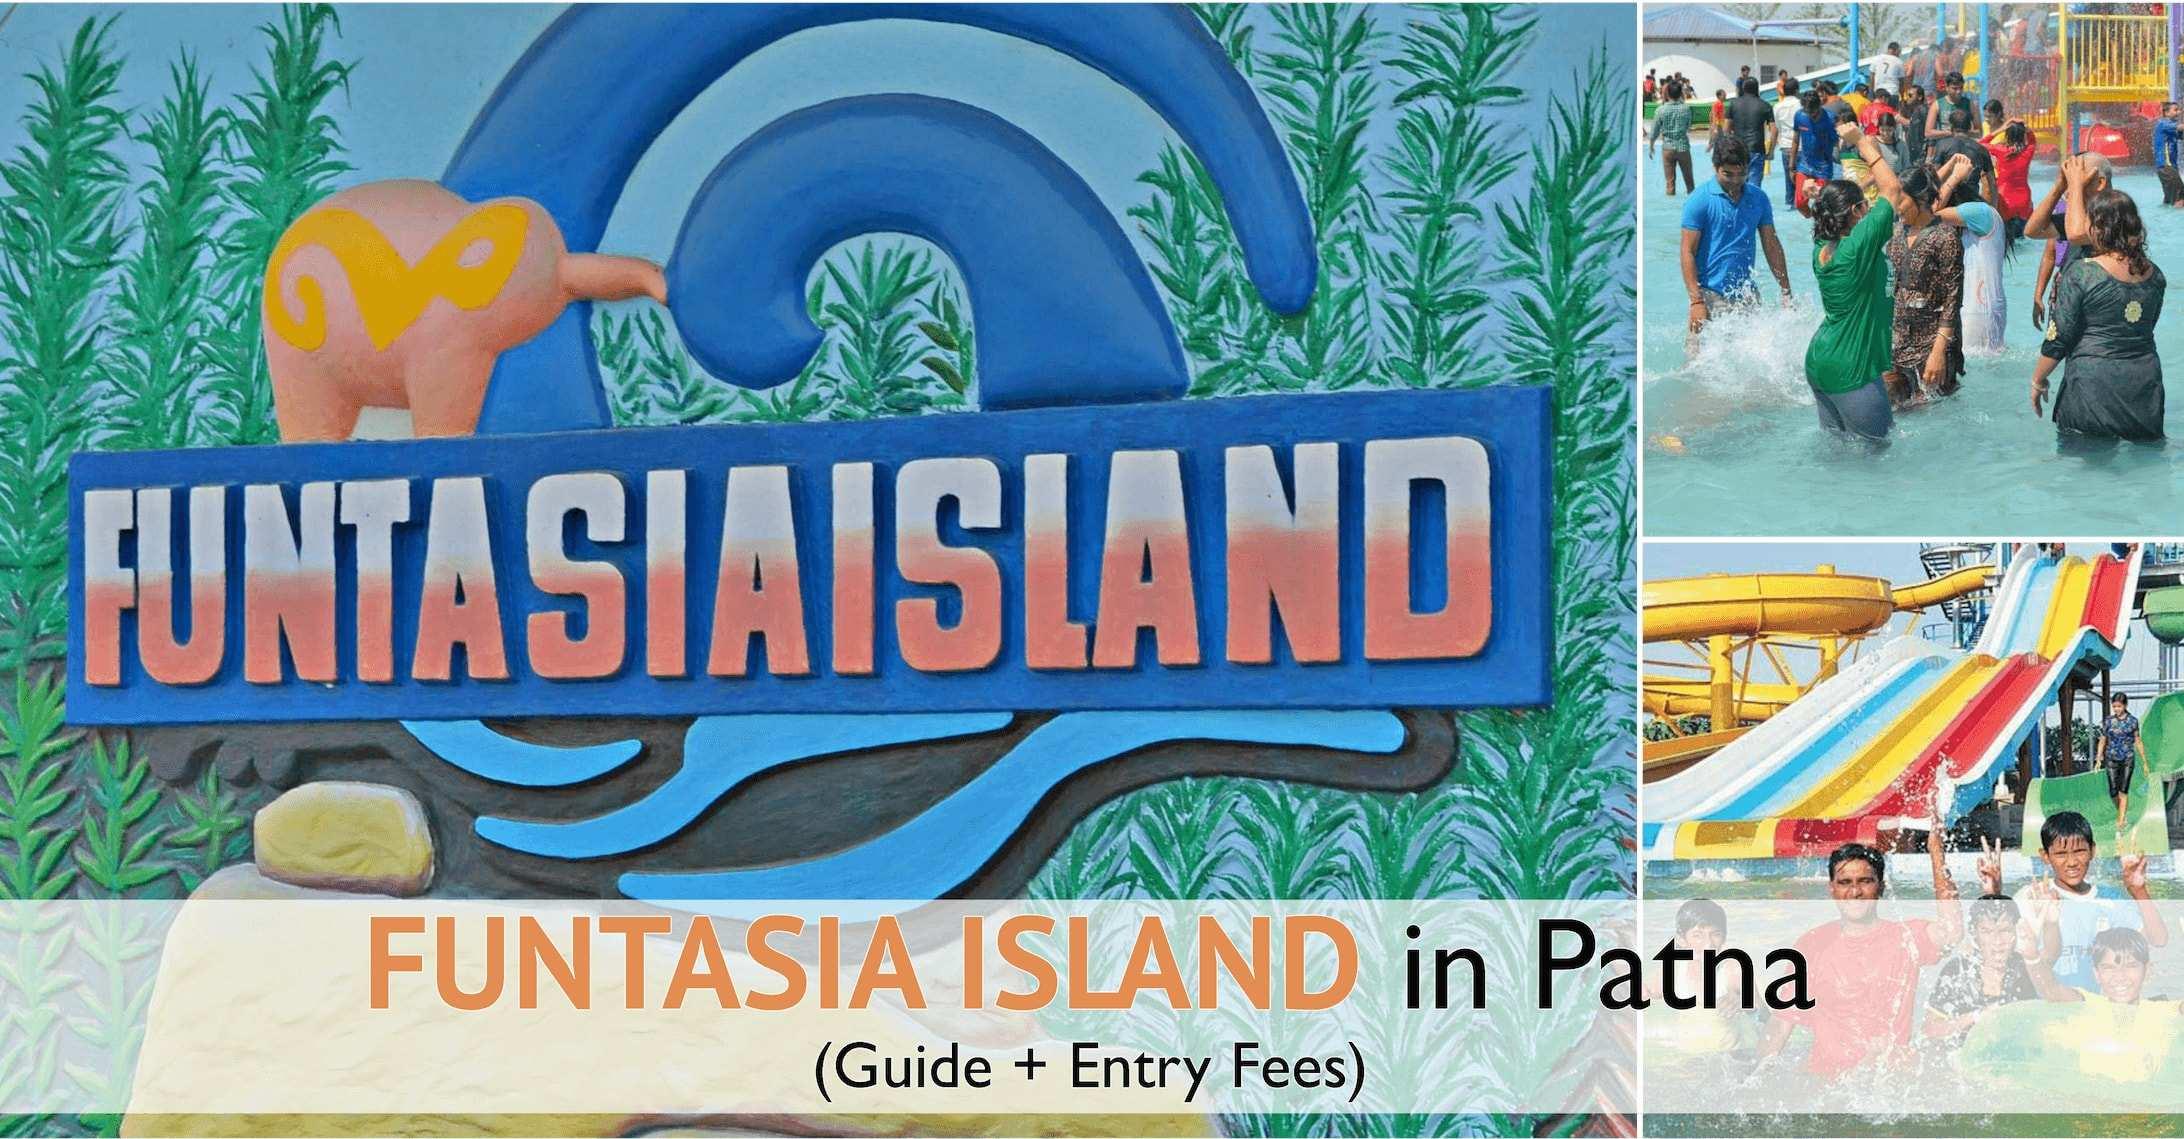 funtasiaisland-water-park-patna.jpg